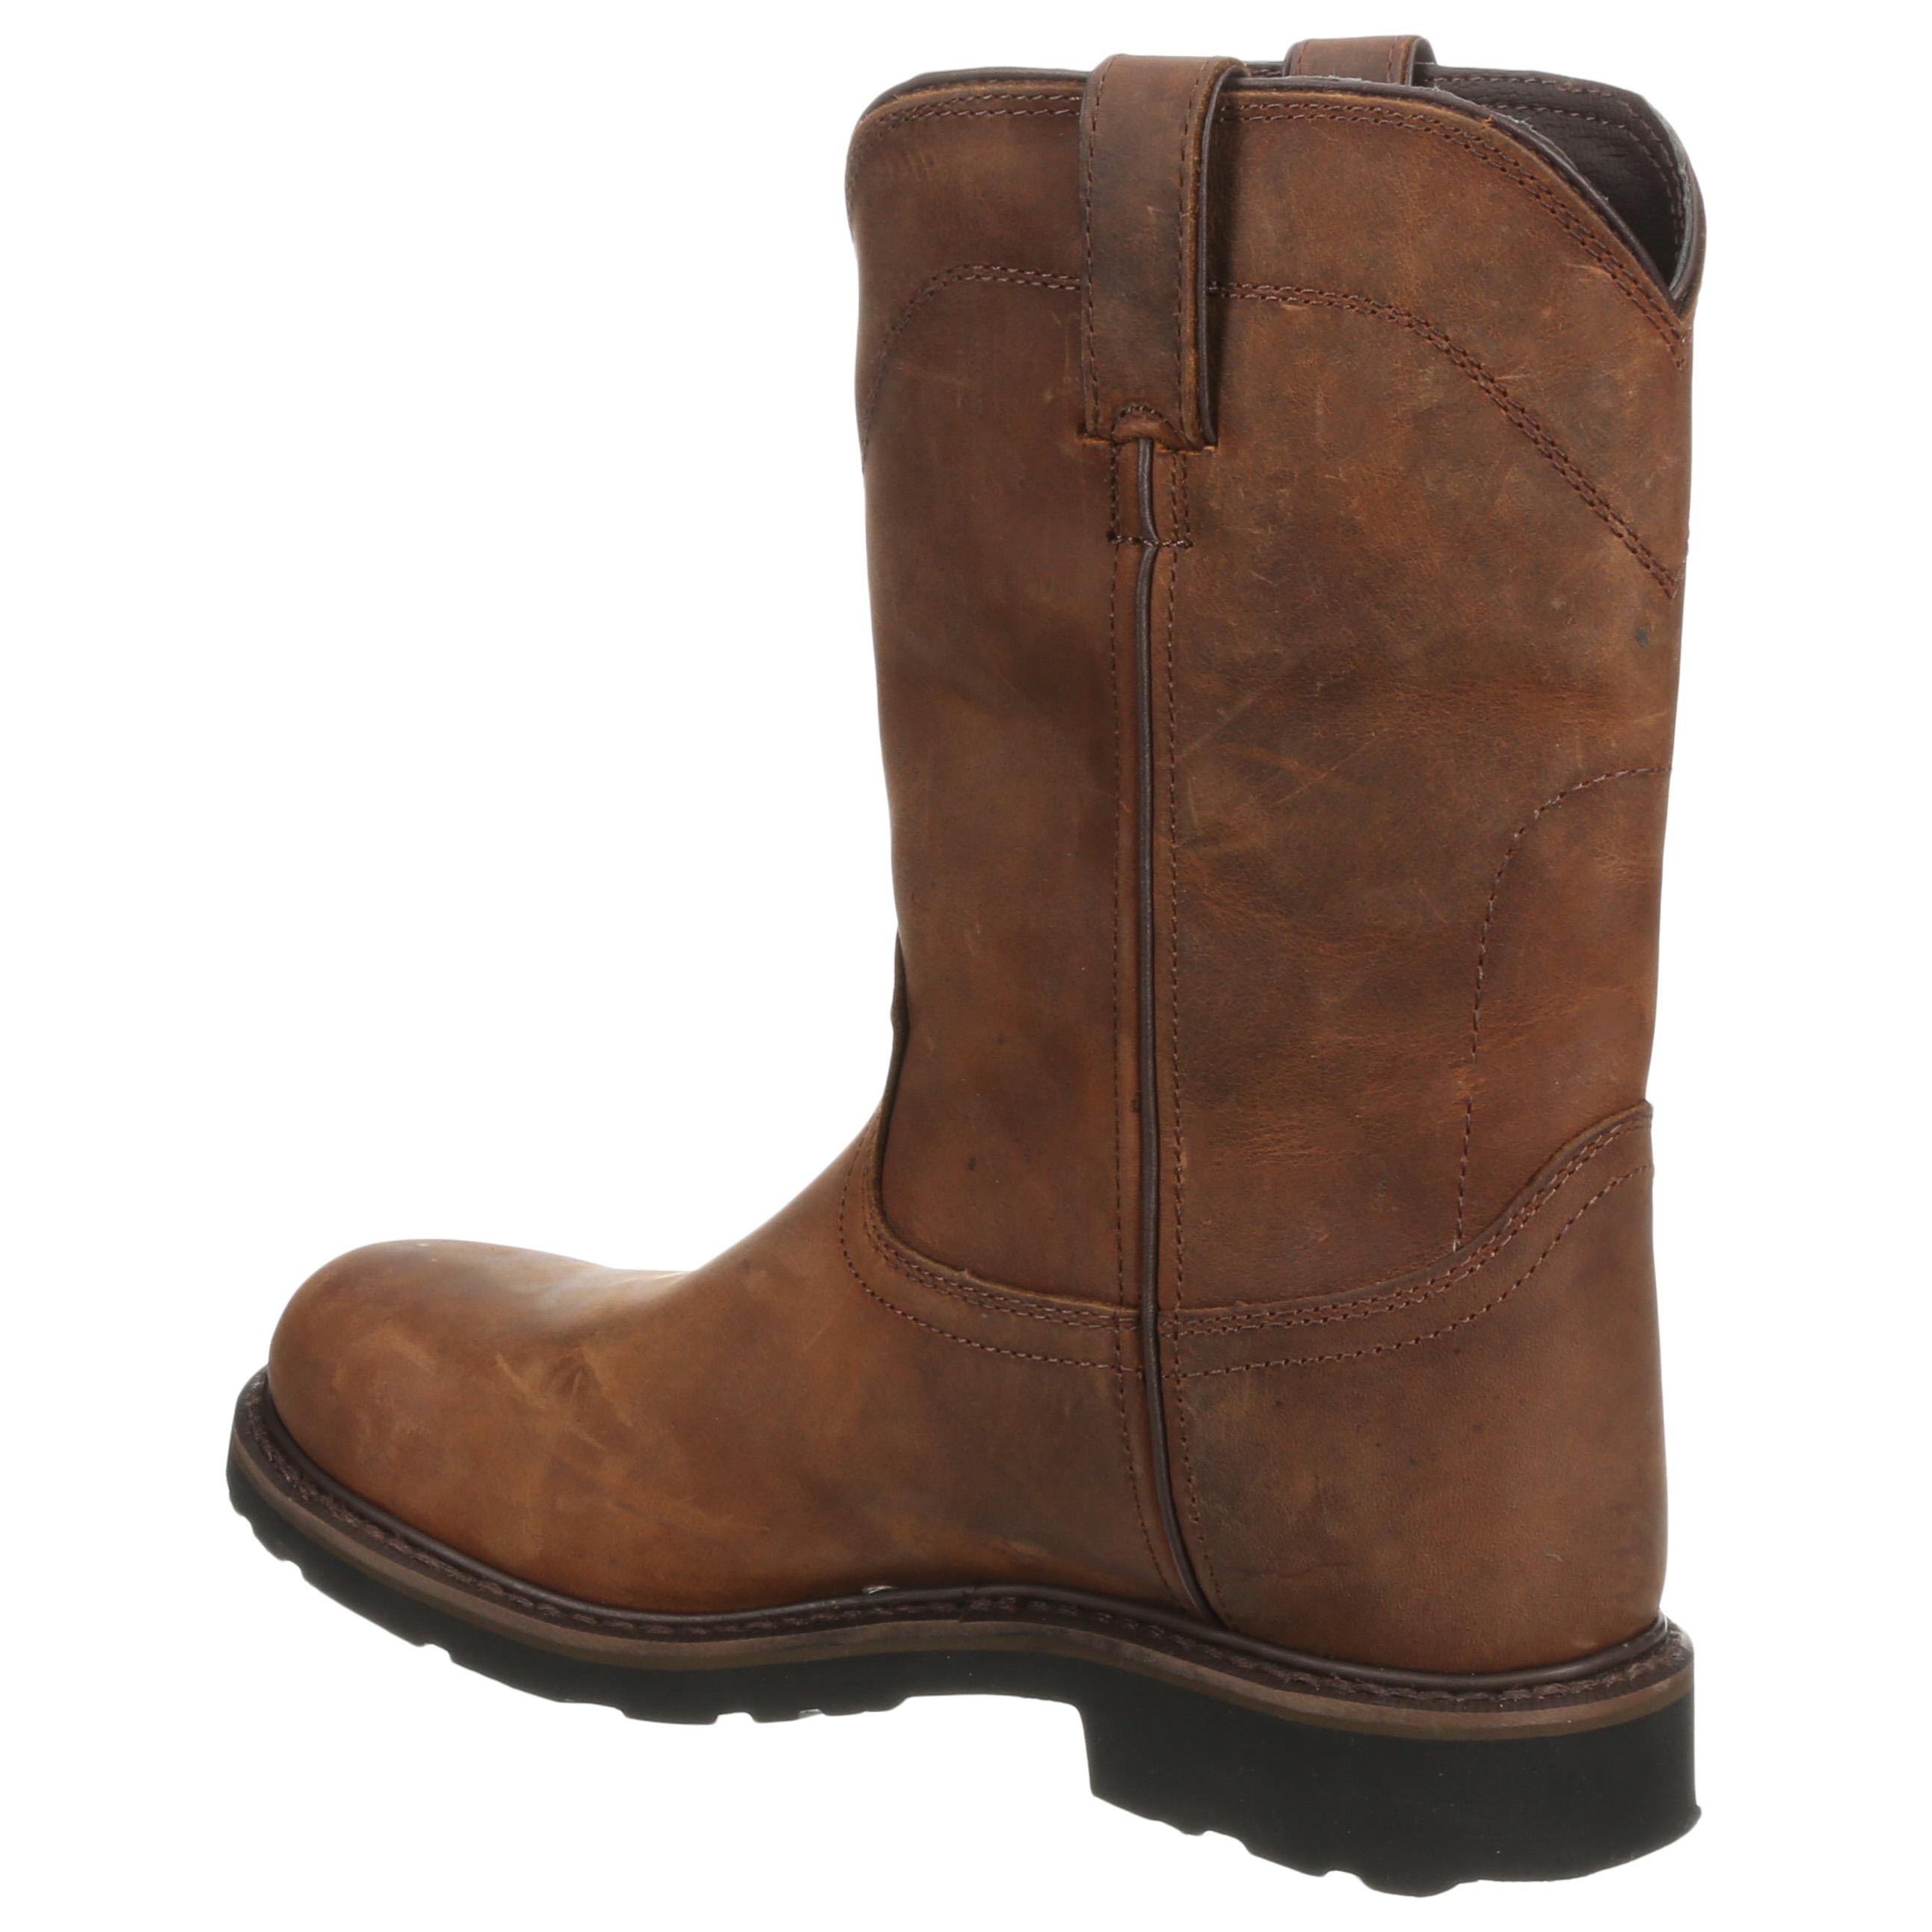 Men's Wyoming Waterproof Work Boot